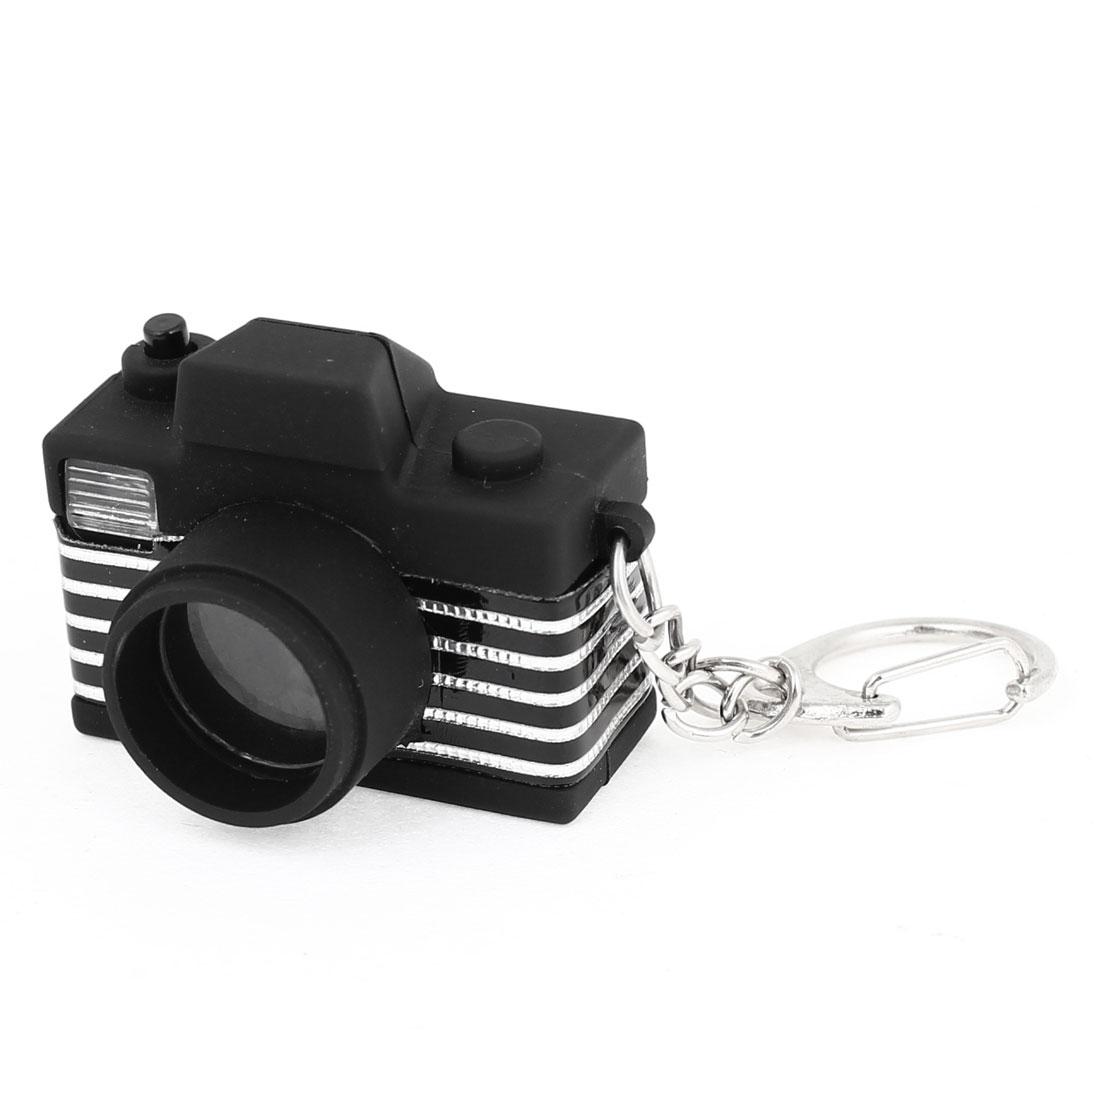 Black Silver Tone Mini Camera Style White Flash Light LED Keychain Gadget